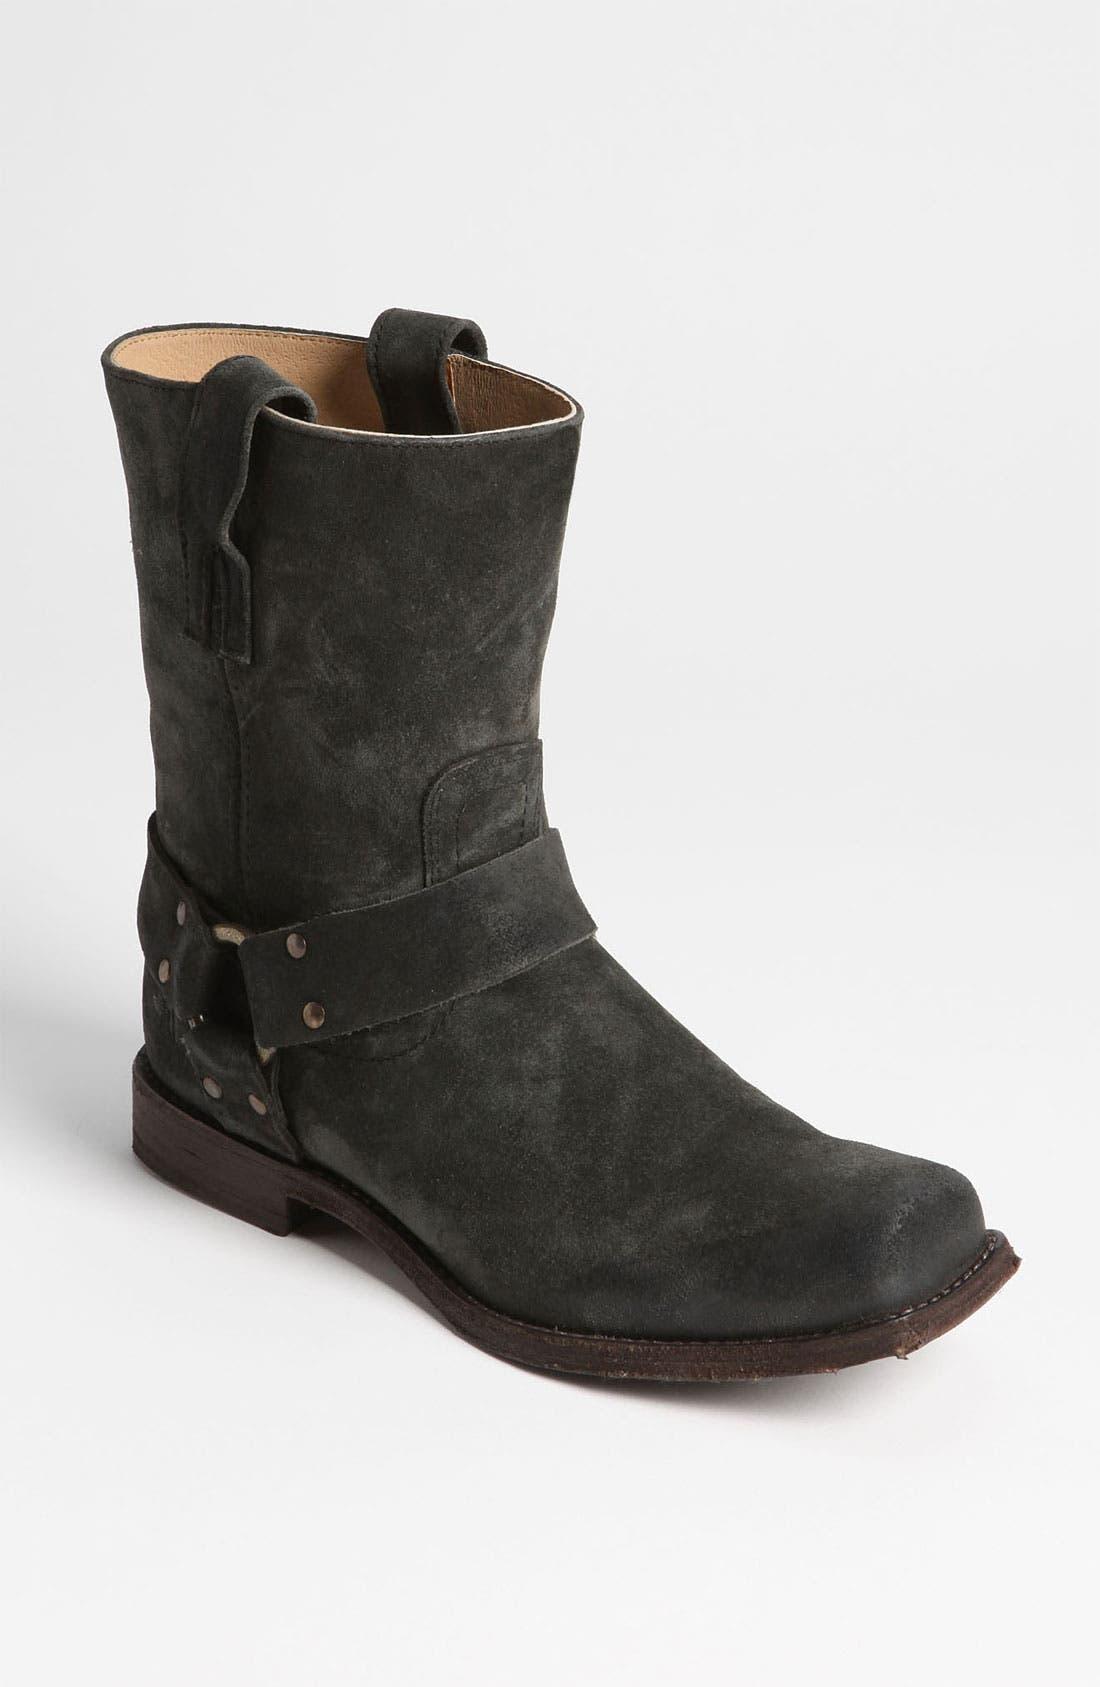 Main Image - Frye 'Smith' Harness Boot